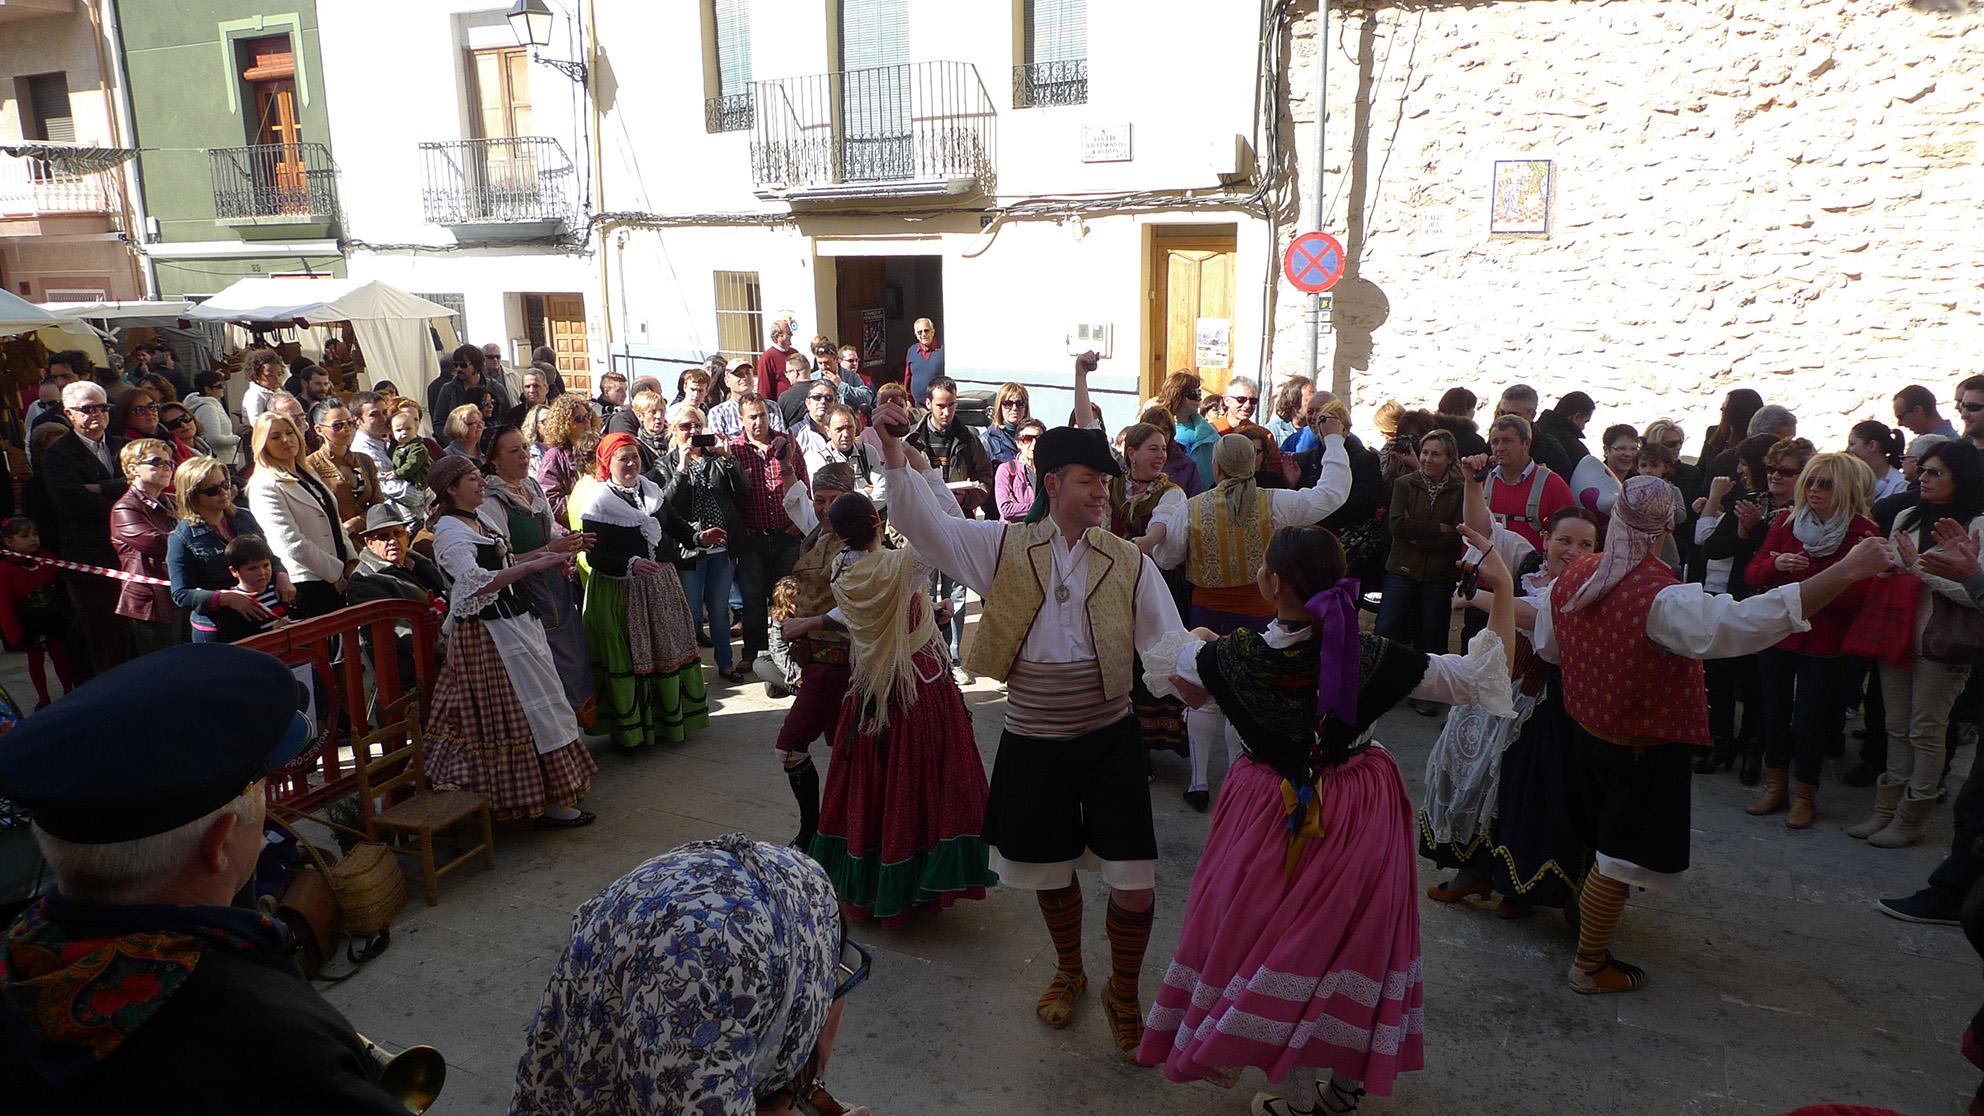 2014-02-23 - Baladre a Fira St. Marcia-ROTOVA (103)